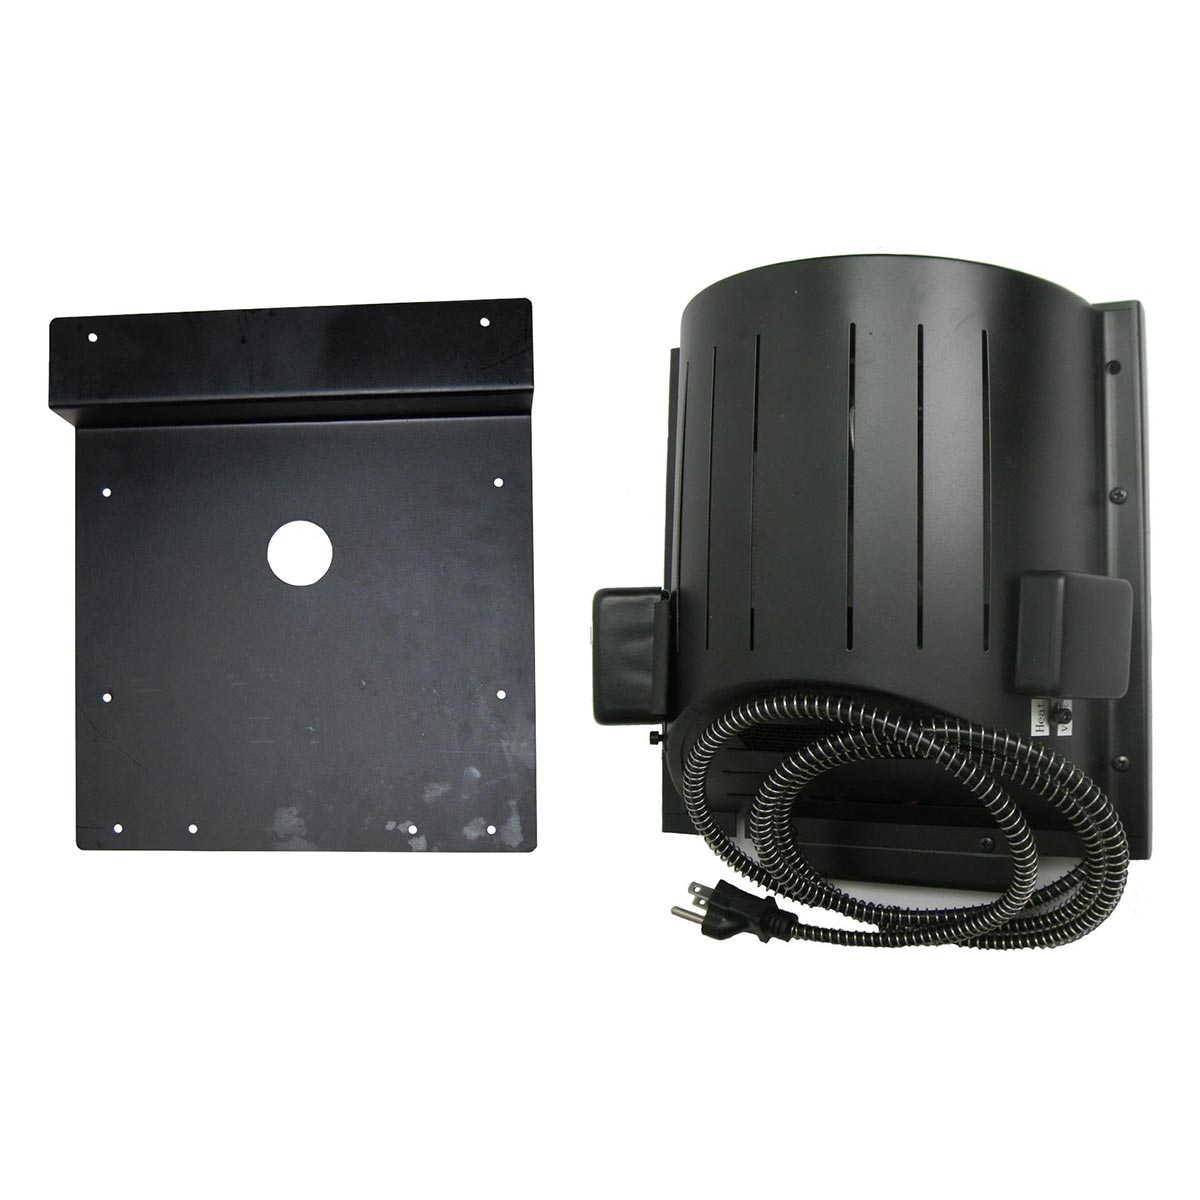 AKOMA Dog Products Heat-N-Breeze Dog House Heater and Fan...